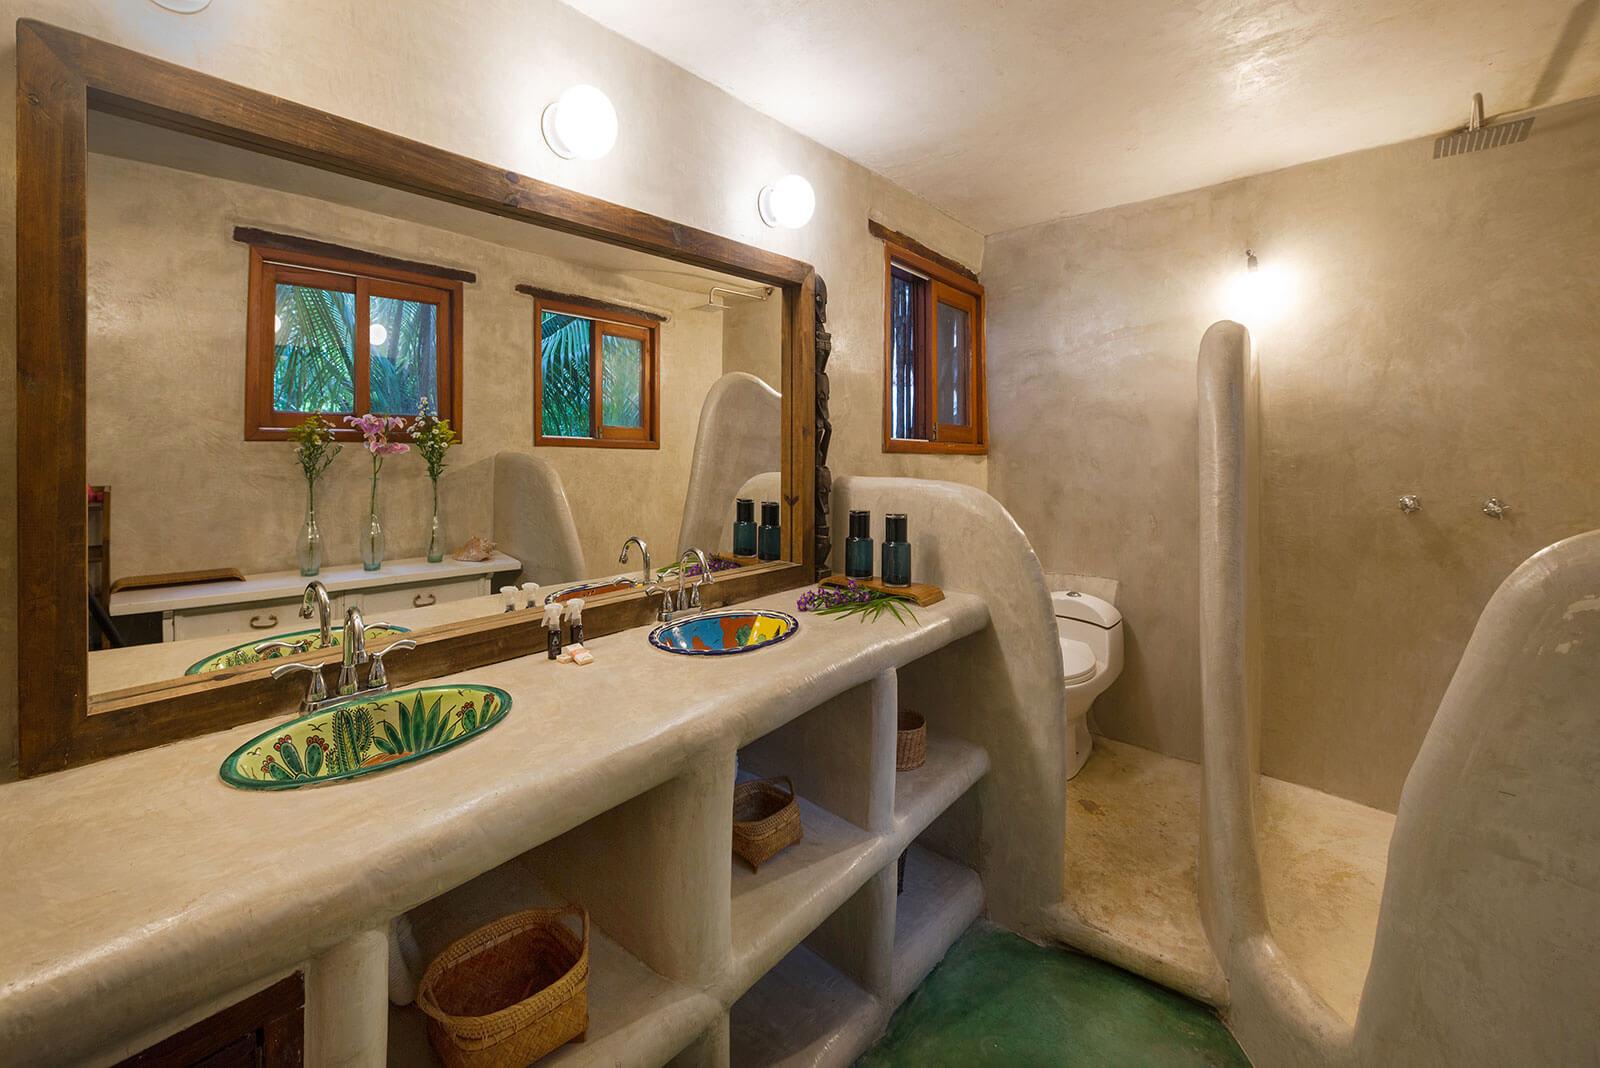 Maya_Luxe_Riviera_Maya_Luxury_Vacations_Villa_Rentals_Tulum_Playa_del_Carmen_Mexico_Bejuco_House_20.jpg